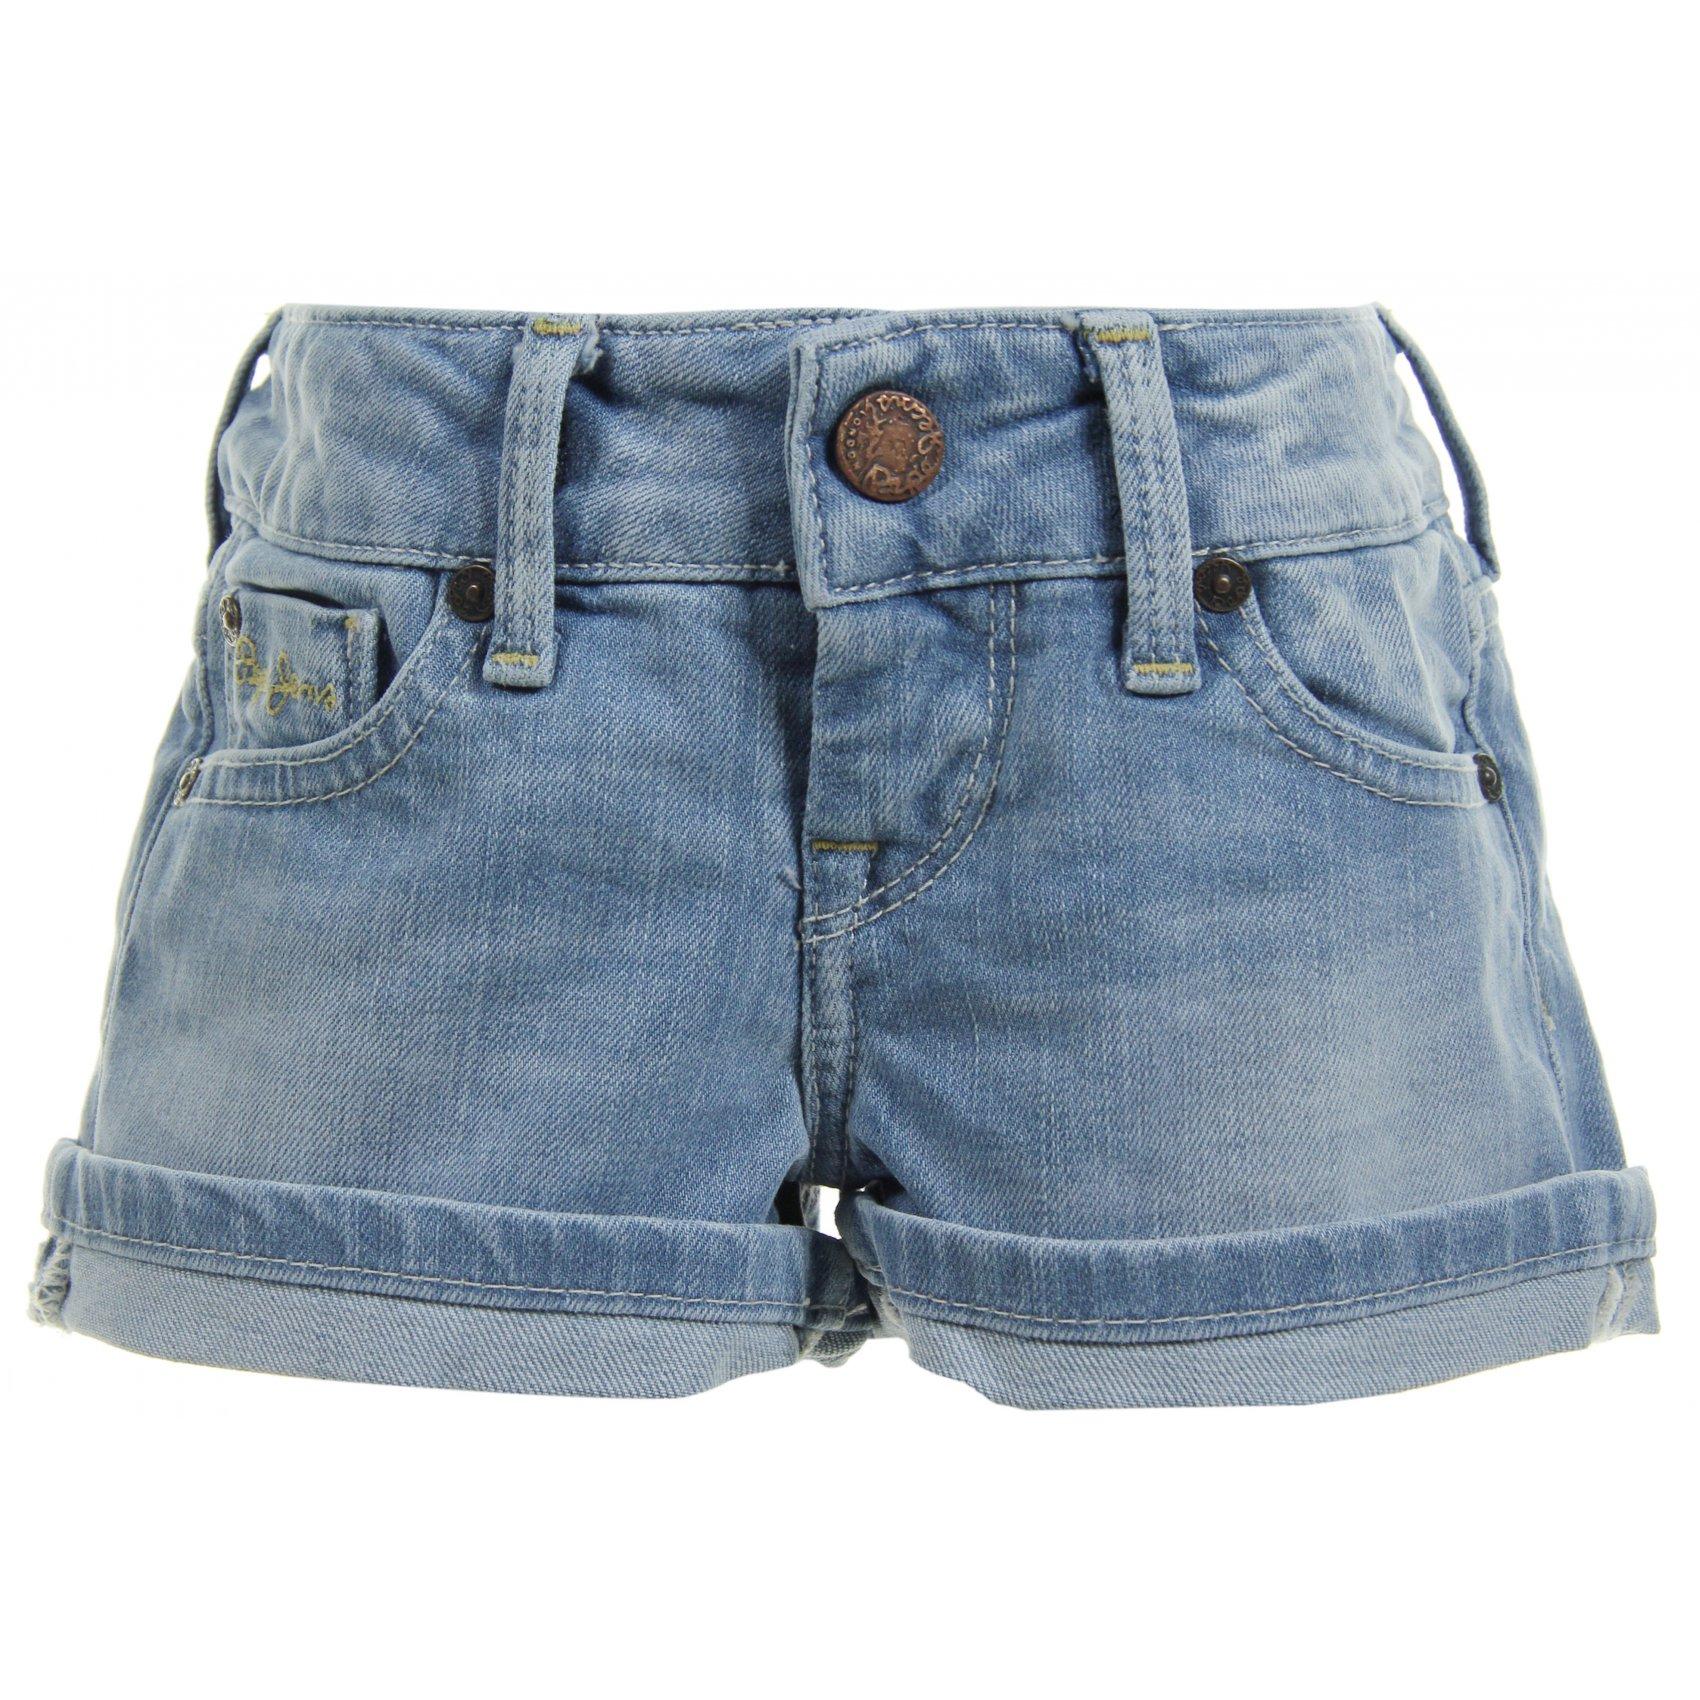 dzieciece-szorty-pepe-jeans-foxtail-pg800177r08-000_5350f36b1bf9f_p_zoom